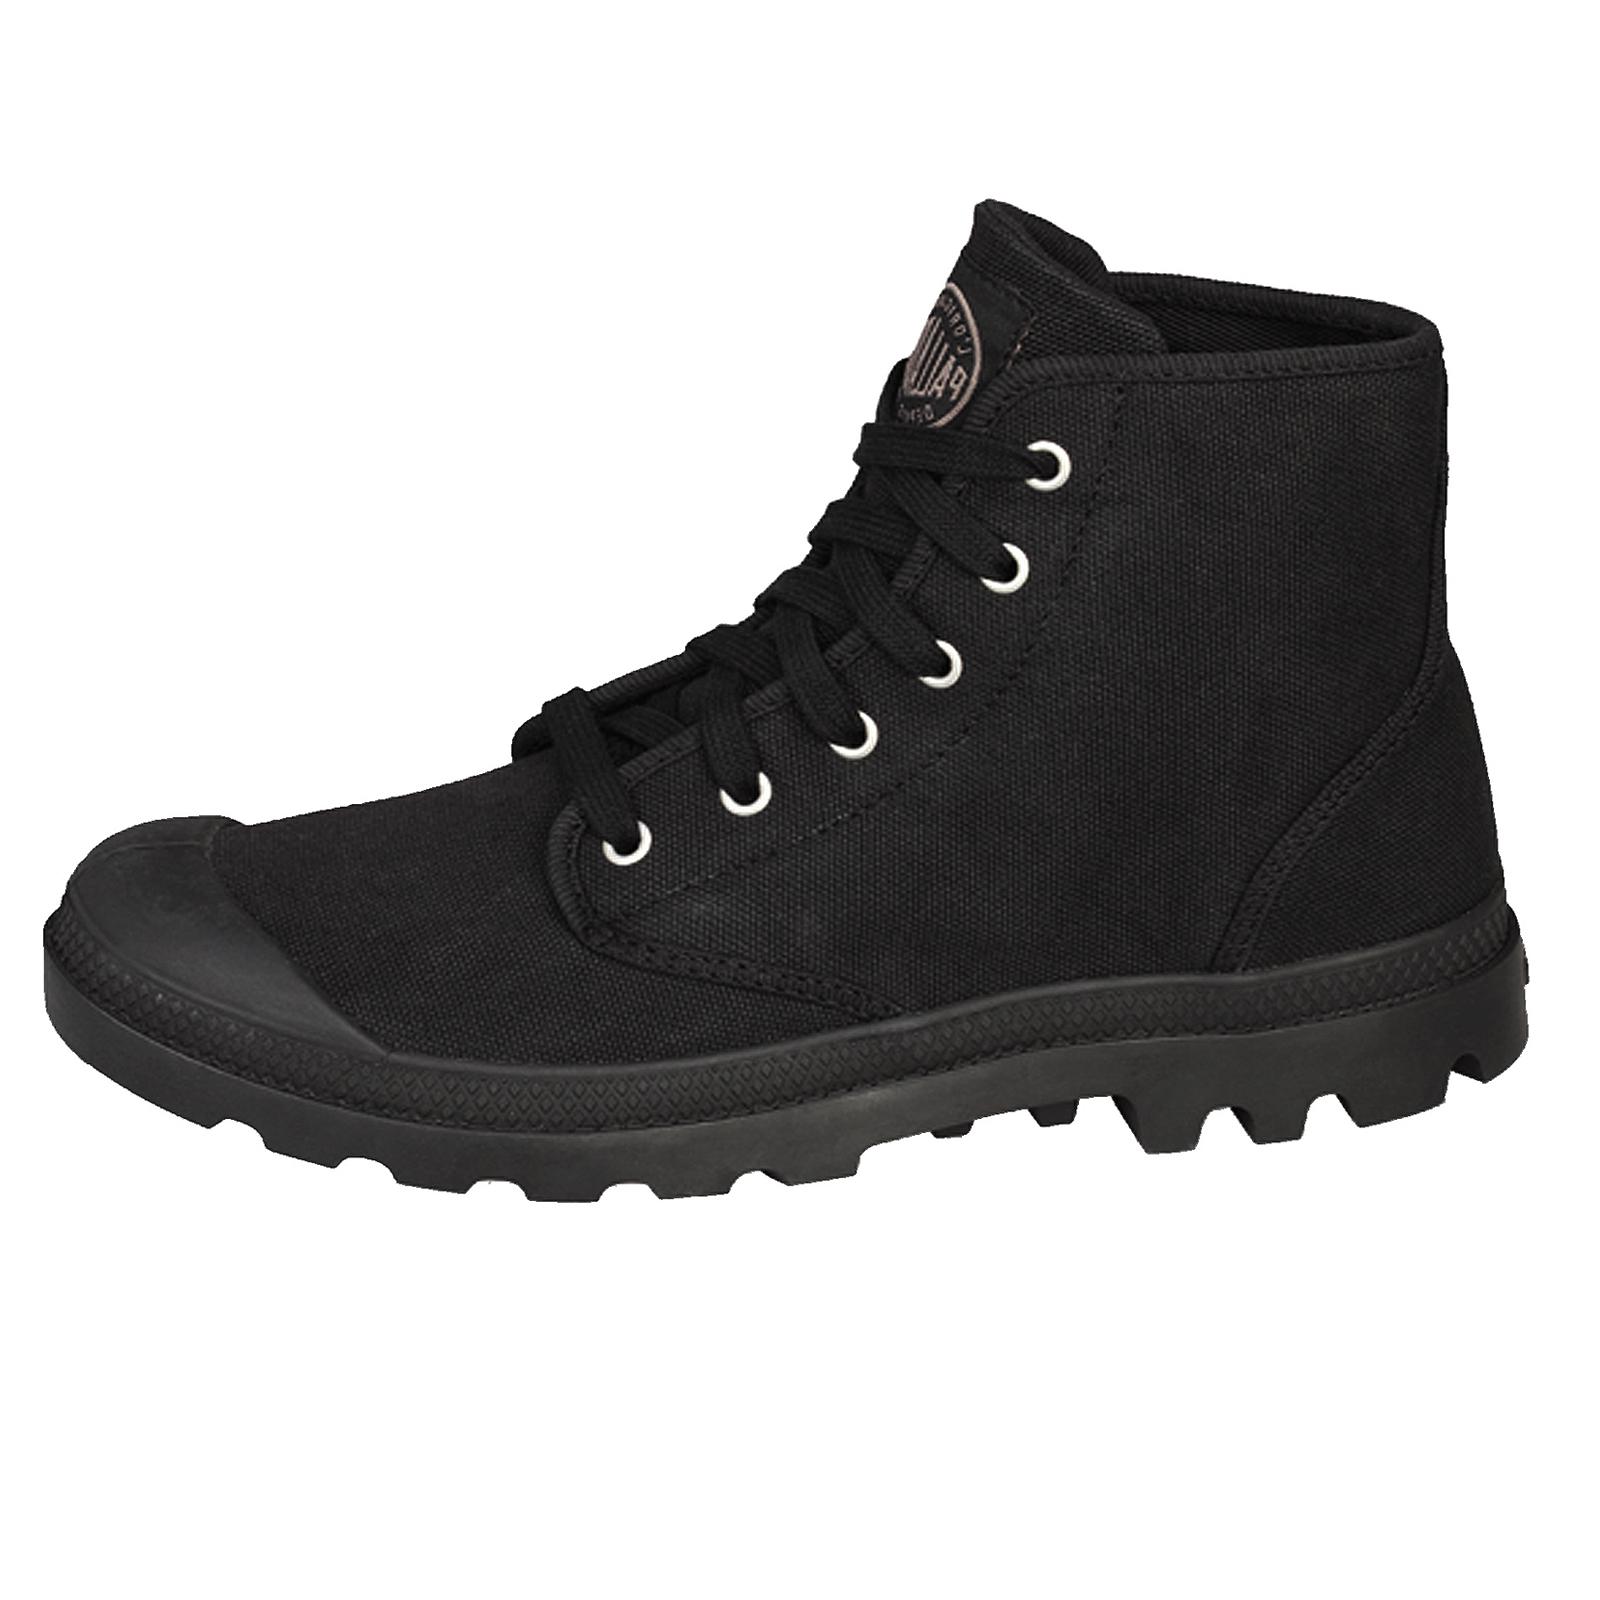 Palladium-Damen-Stiefeletten-Stiefel-Pampa-Hi-Top-Damen-Canvas-Sneaker-Wanderschuhe Indexbild 3